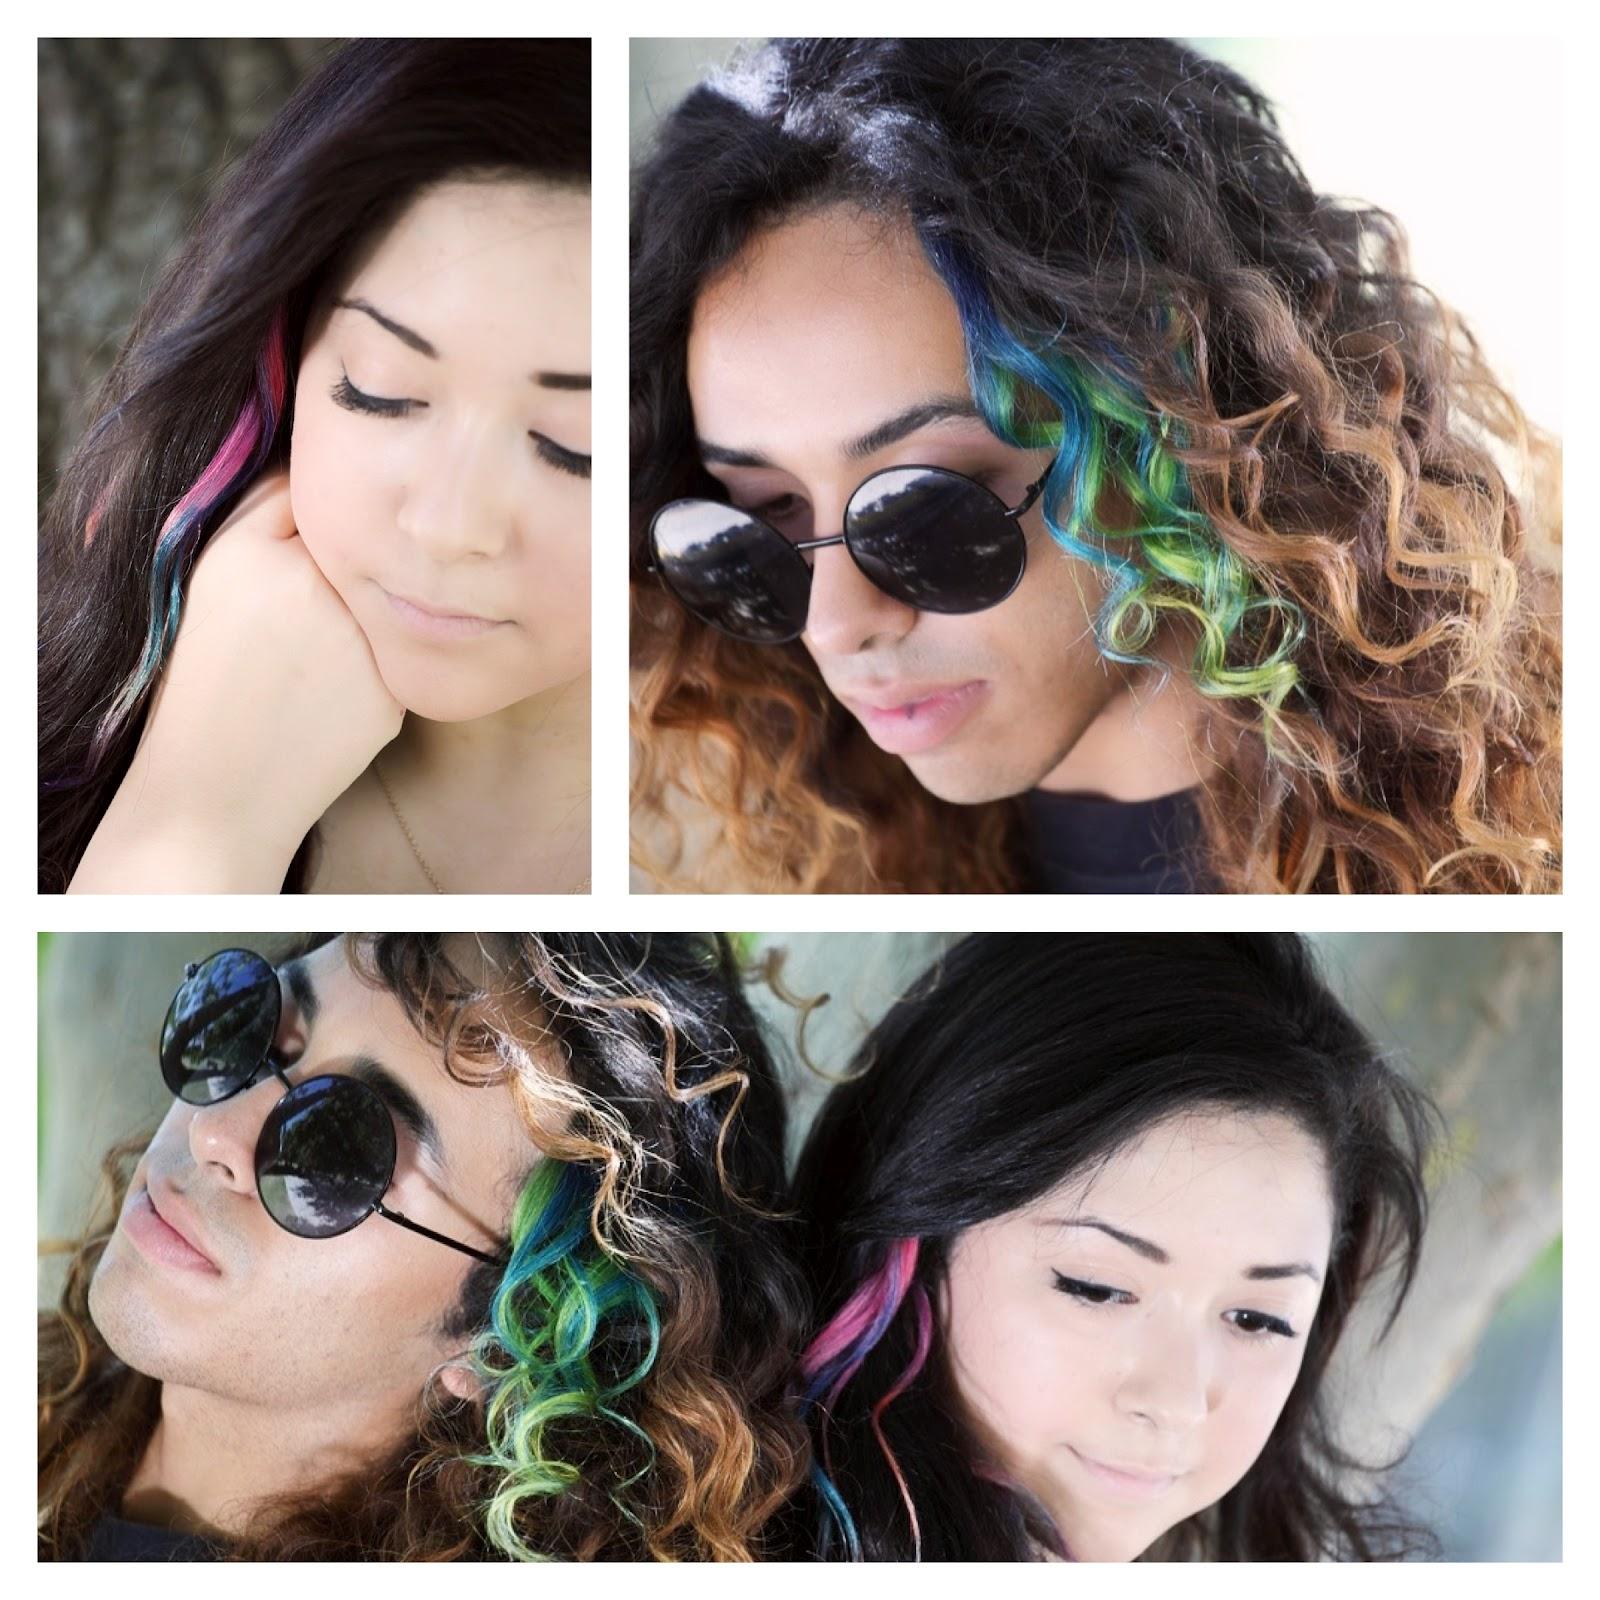 Cool Diy Hair: ILoveToCreate Blog: Tie-Dye Hair Extensions! DIY Rainbow Hair